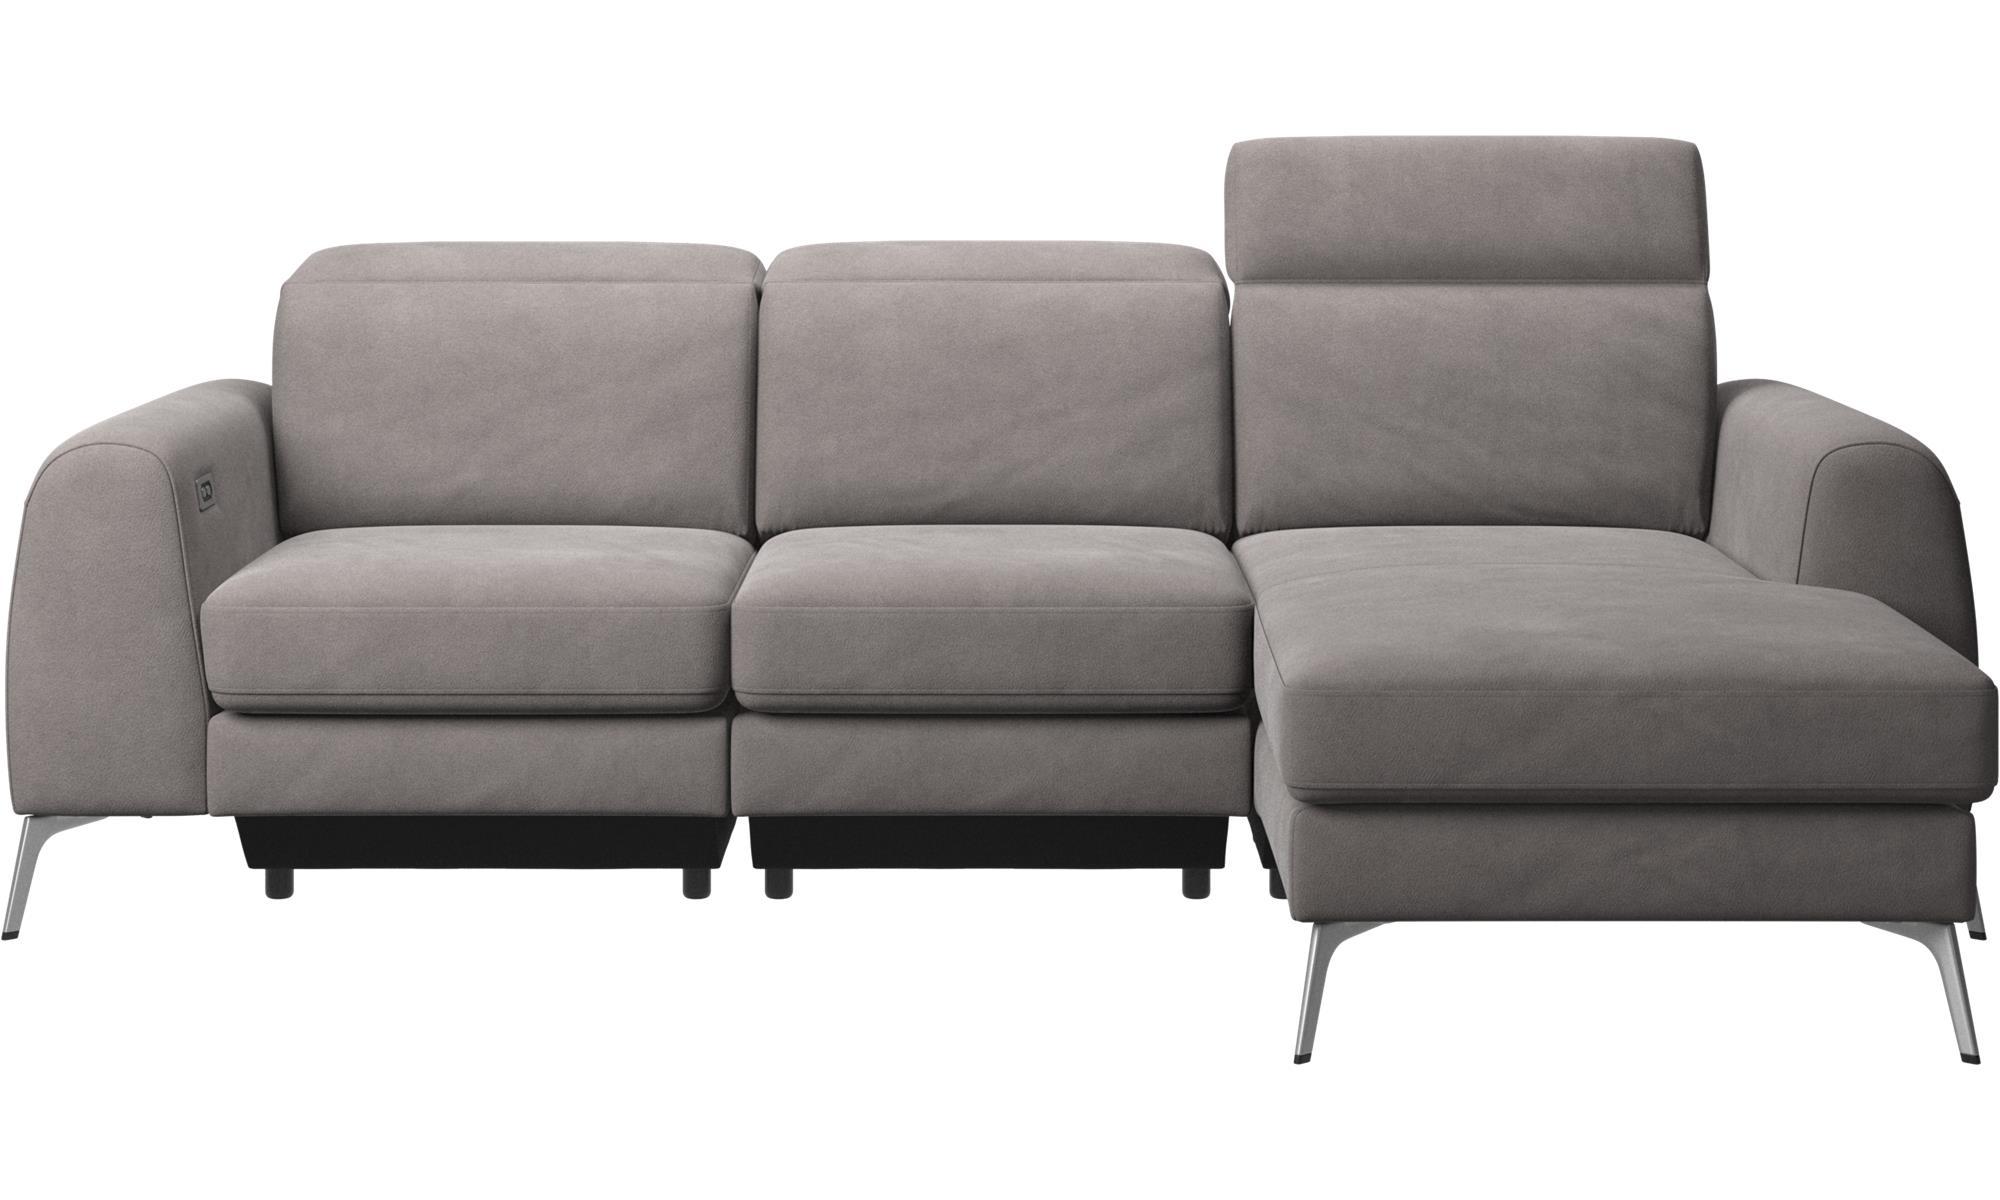 canap s 3 places canap madison avec module chaise. Black Bedroom Furniture Sets. Home Design Ideas